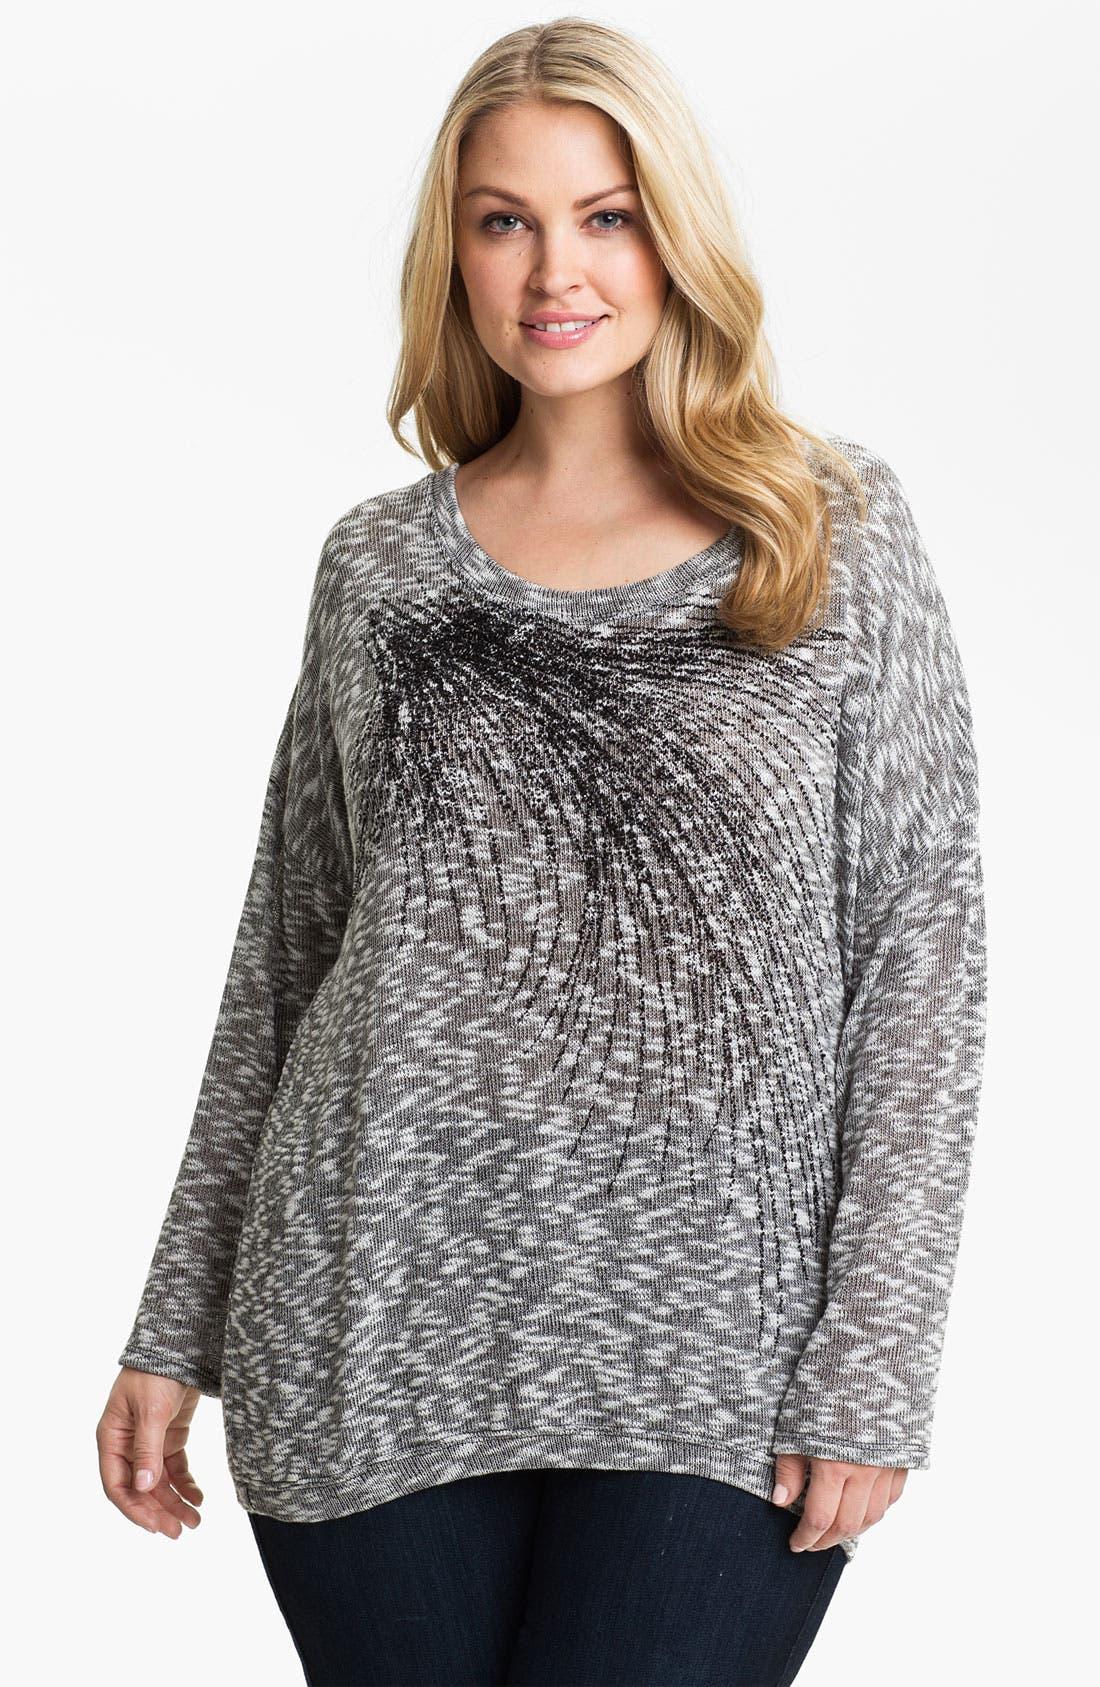 Alternate Image 1 Selected - Madison & Berkeley Beaded Space Dye Sweater (Plus)